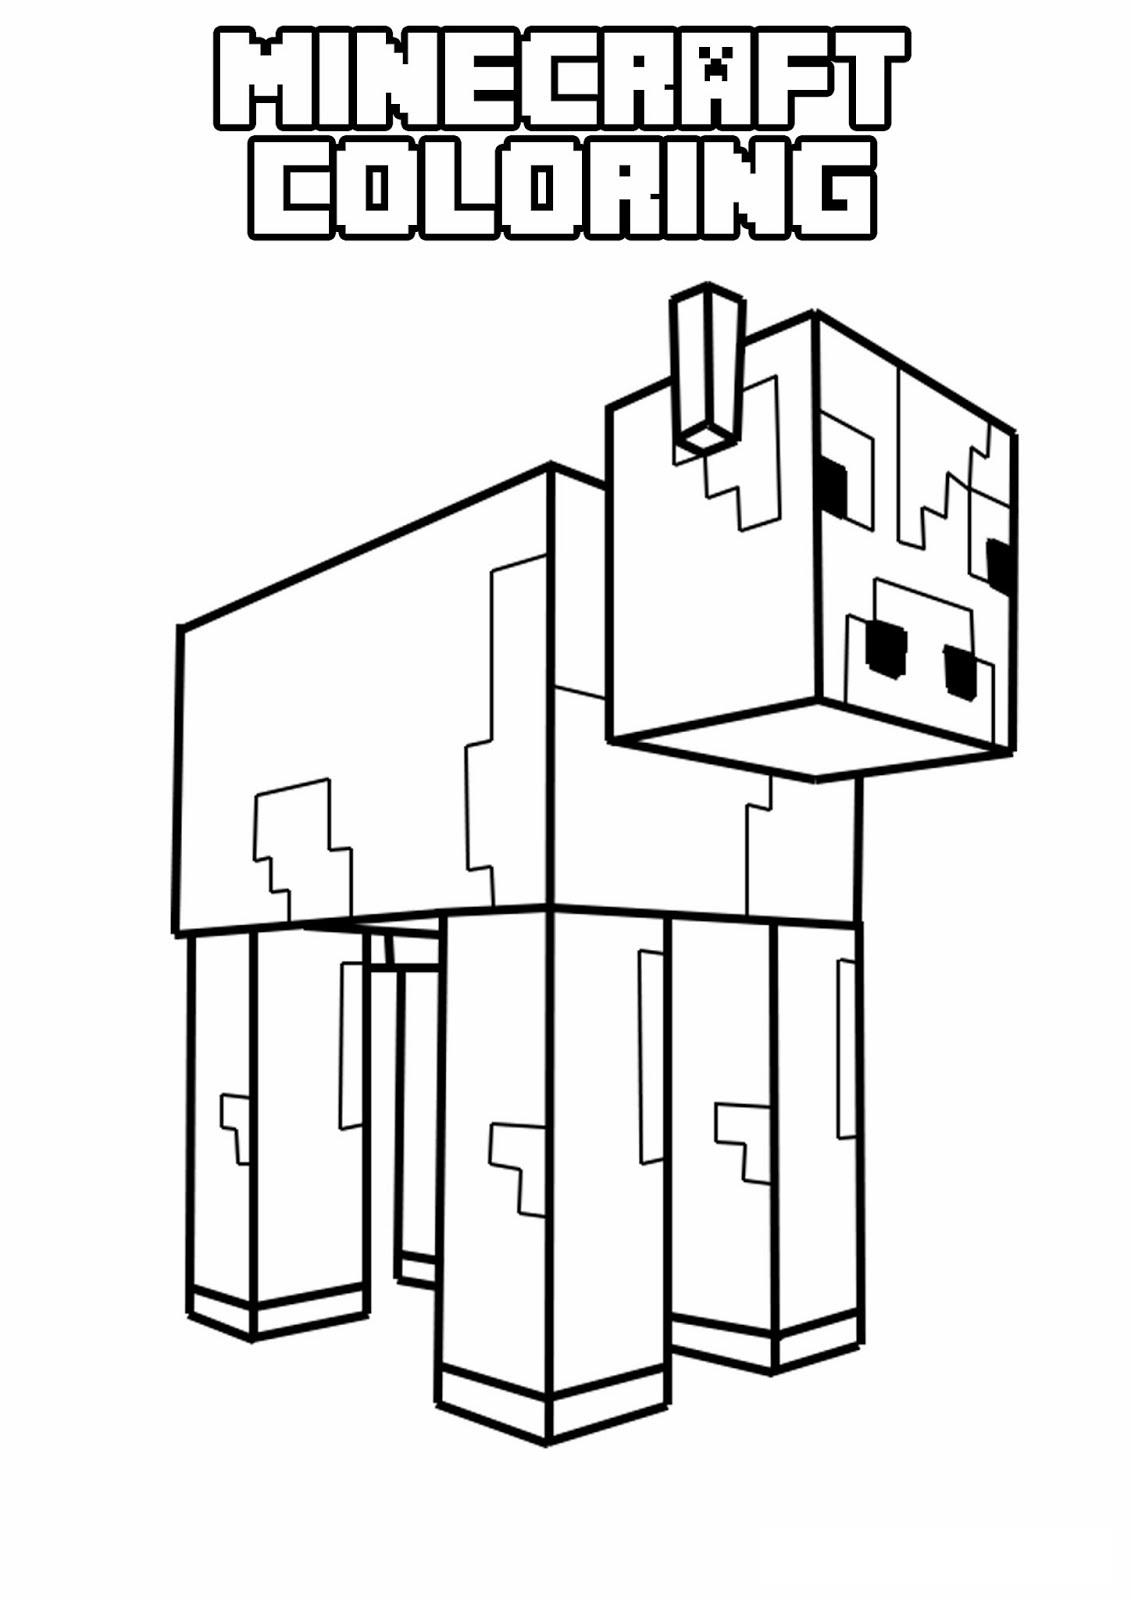 Pin By Endermanik123 On Minecraft Minecraft Coloring Pages Cow Coloring Pages Minecraft Printables